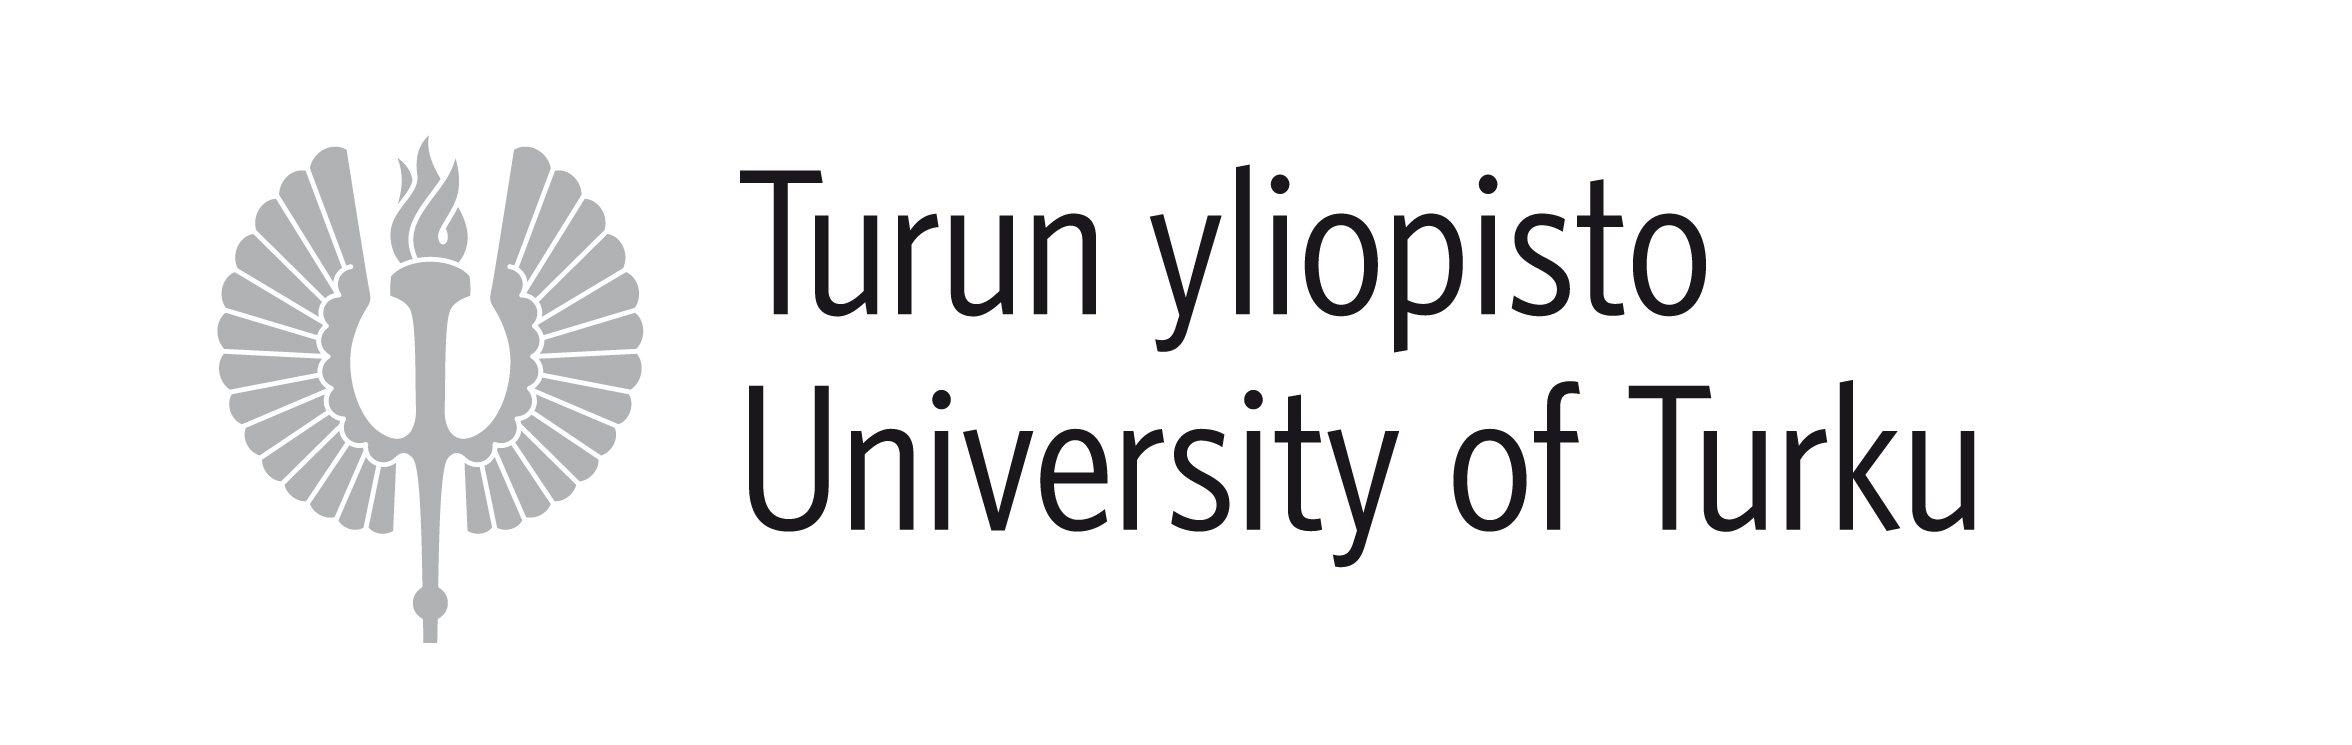 Doctoral thesis on spirituality